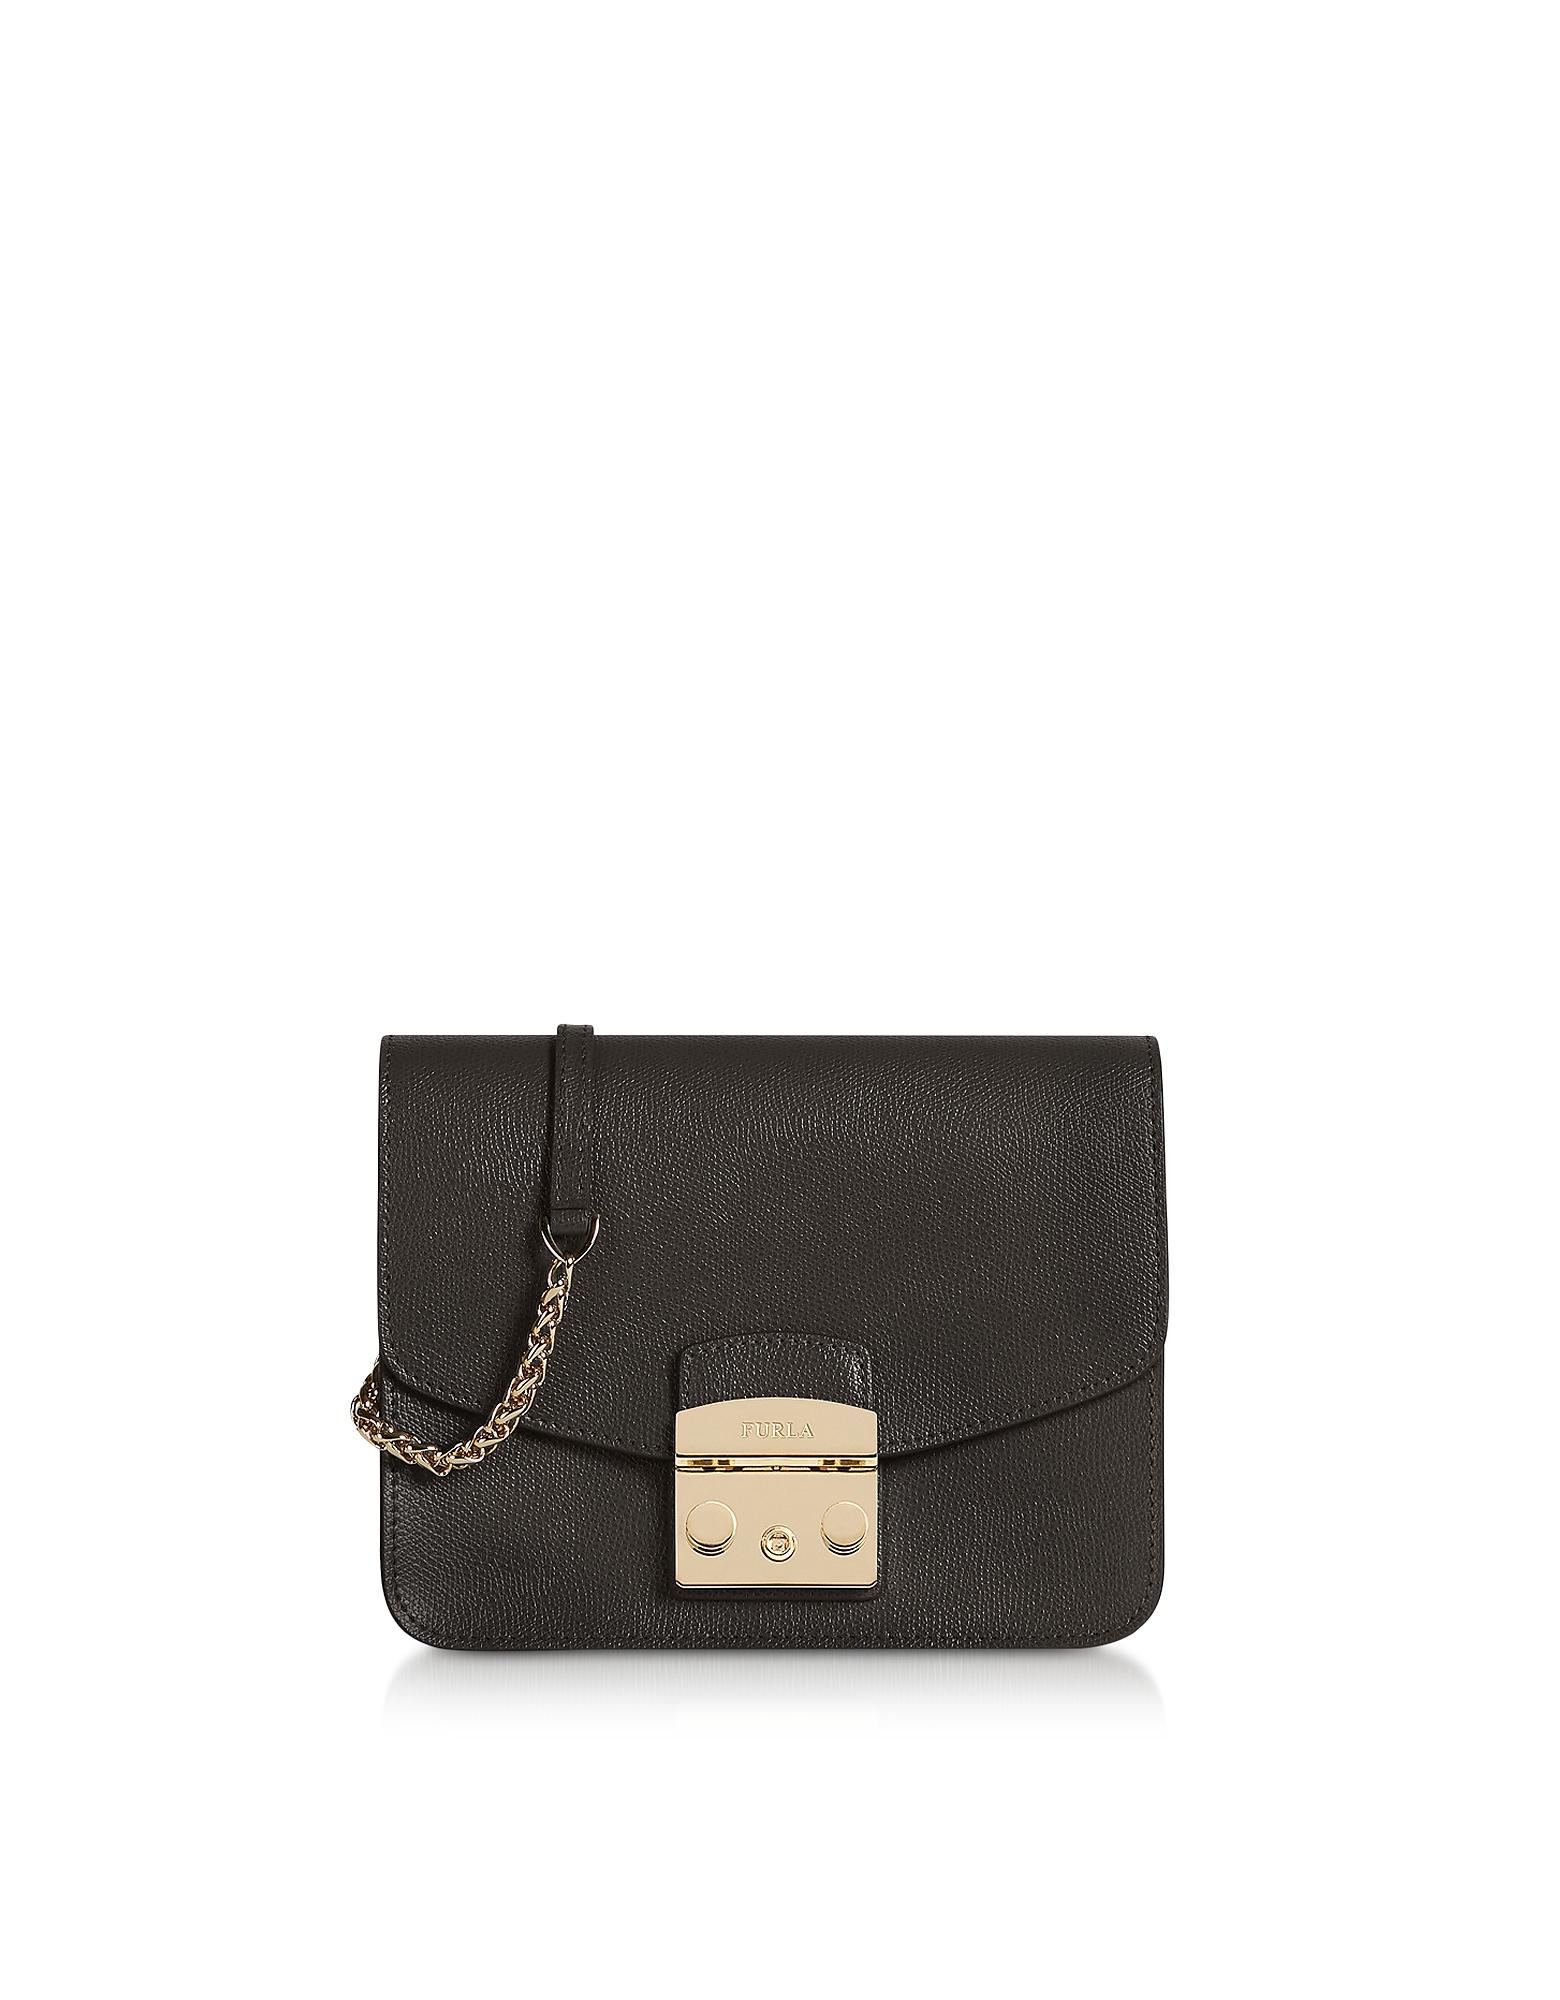 Furla Designer Handbags, Metropolis S Crossbody Bag